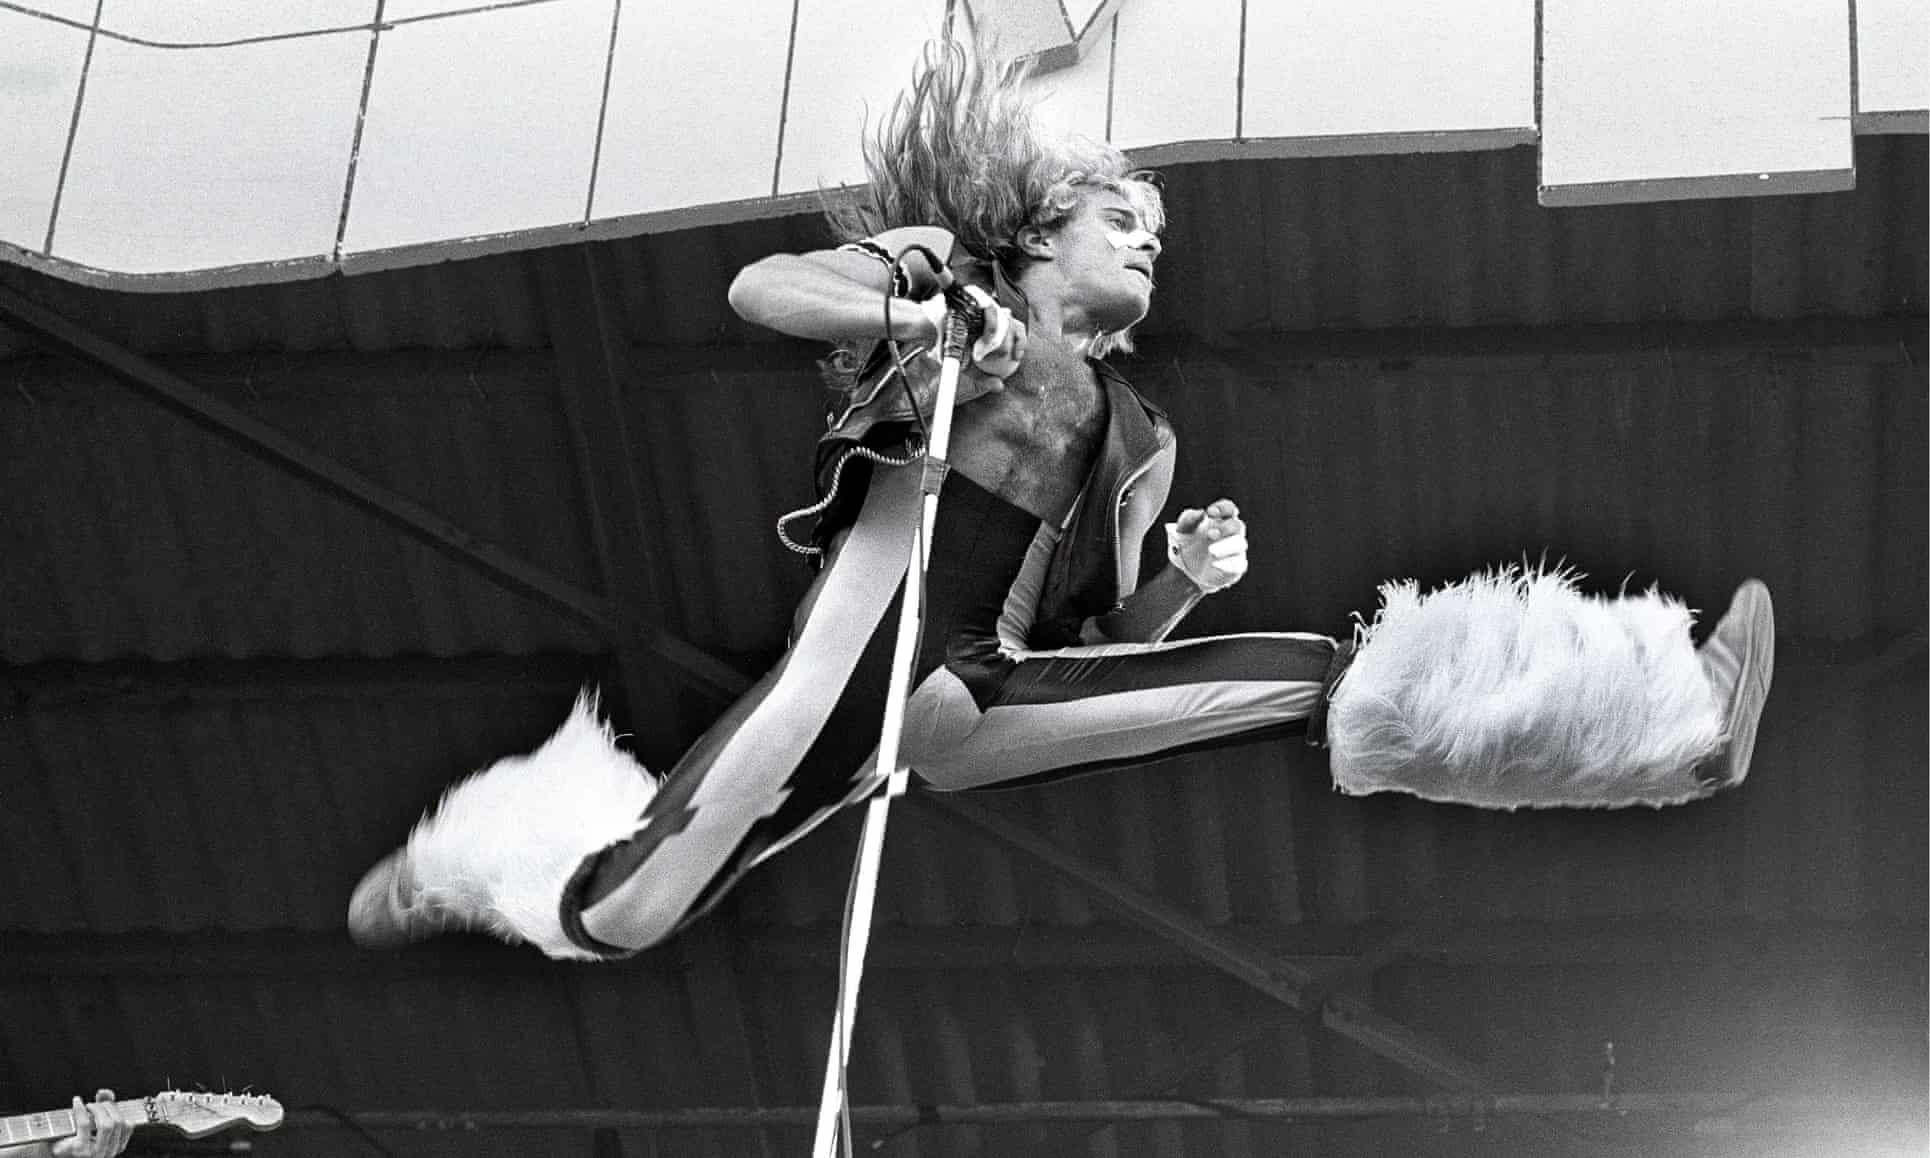 David Lee Roth My Advice For Aspiring Artists Breathable Fabrics Fashion The Guardian David Lee Roth David Lee Van Halen